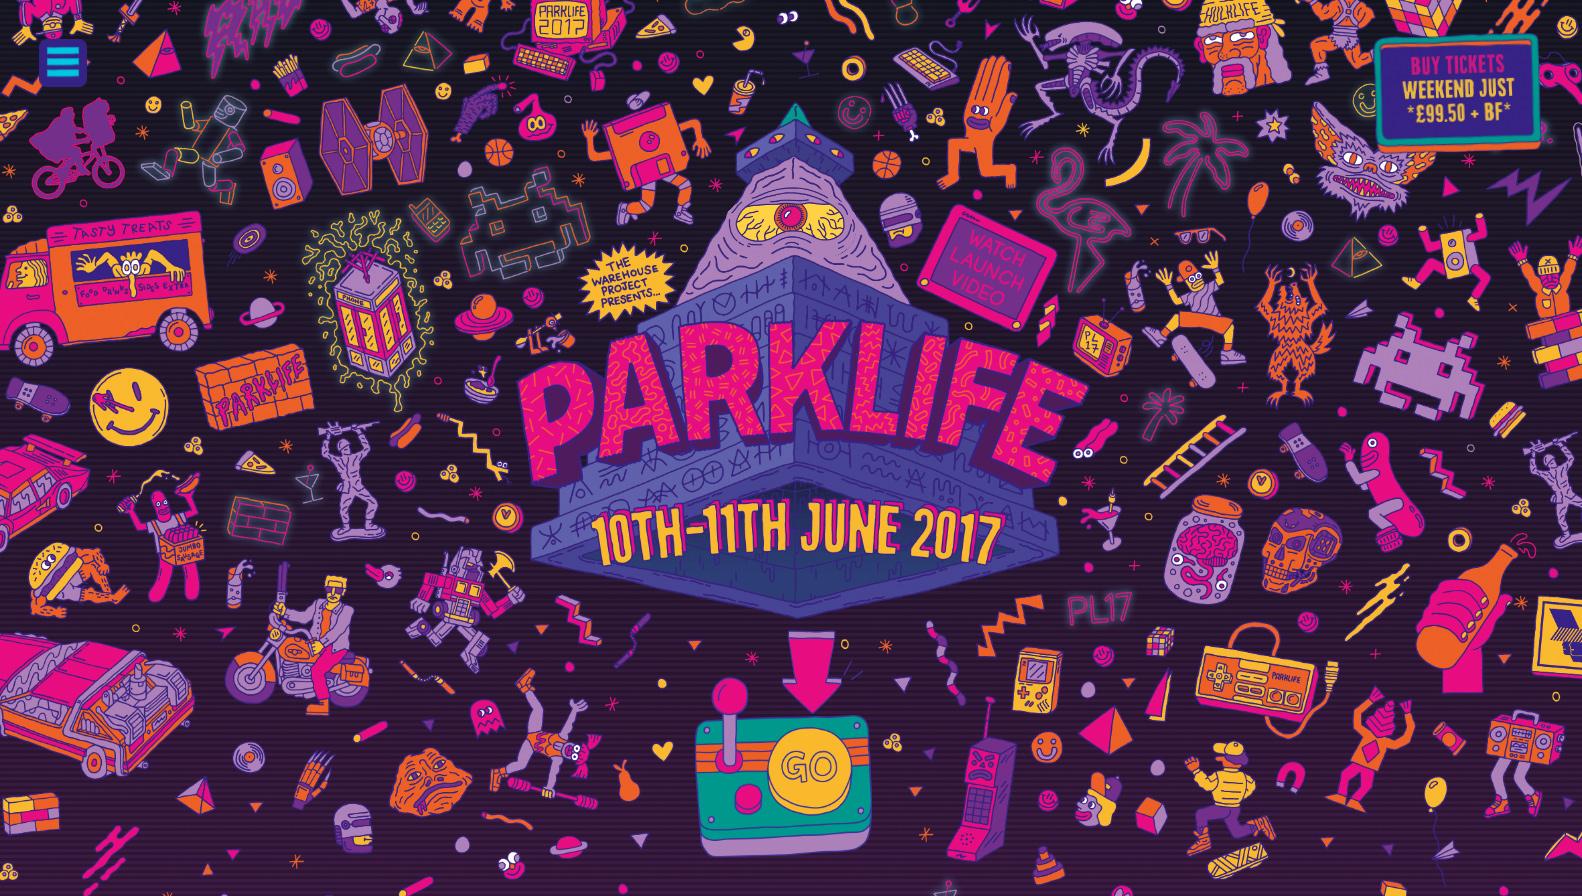 Parklife 2017